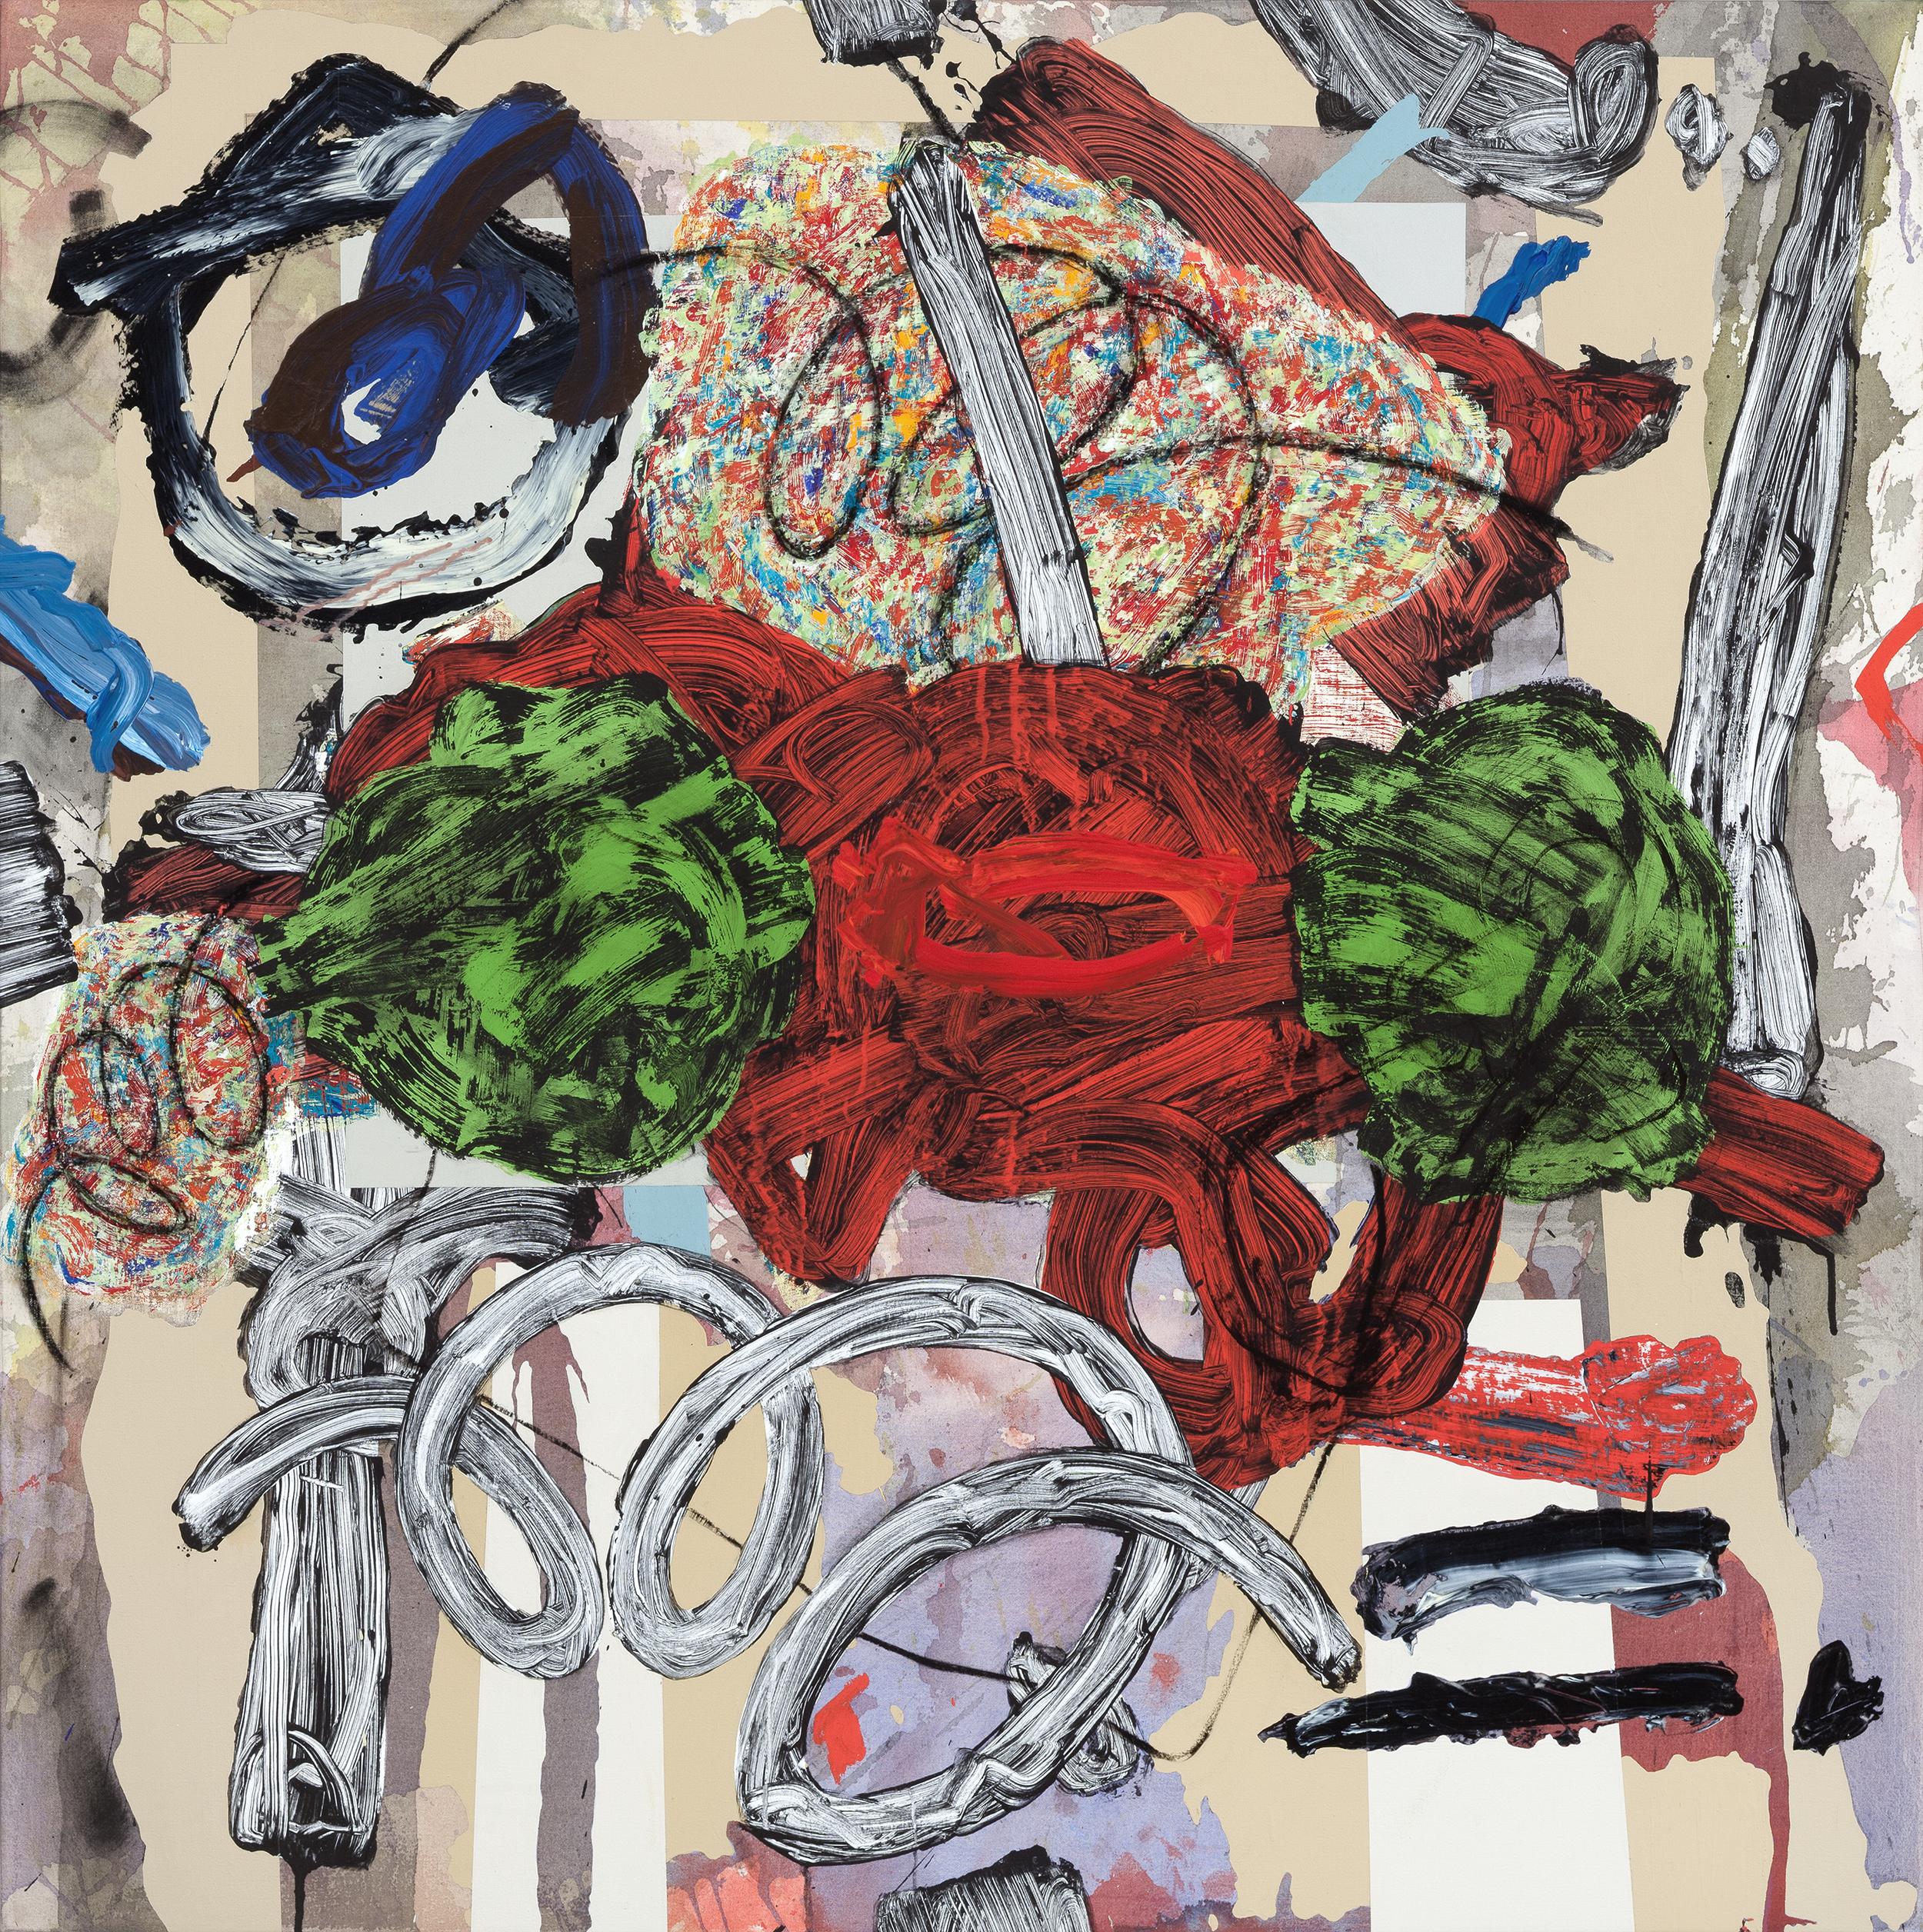 SYMMETRY FAILING, 2017   mixed media on canvas 42 x 42 in.